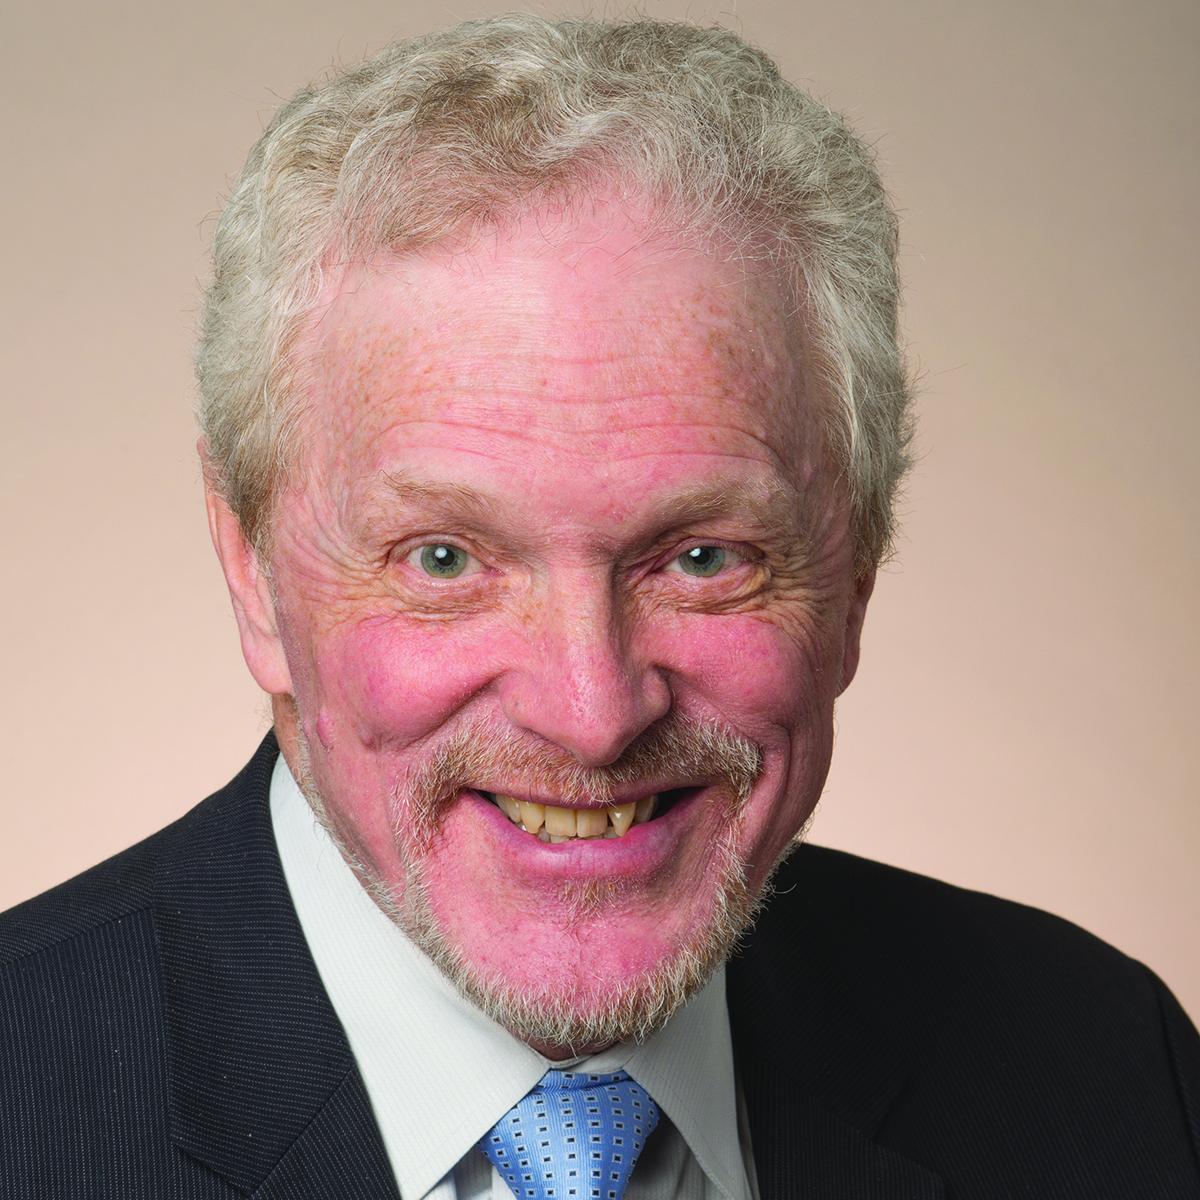 Hon. Eugene R. Wedoff (ret.)